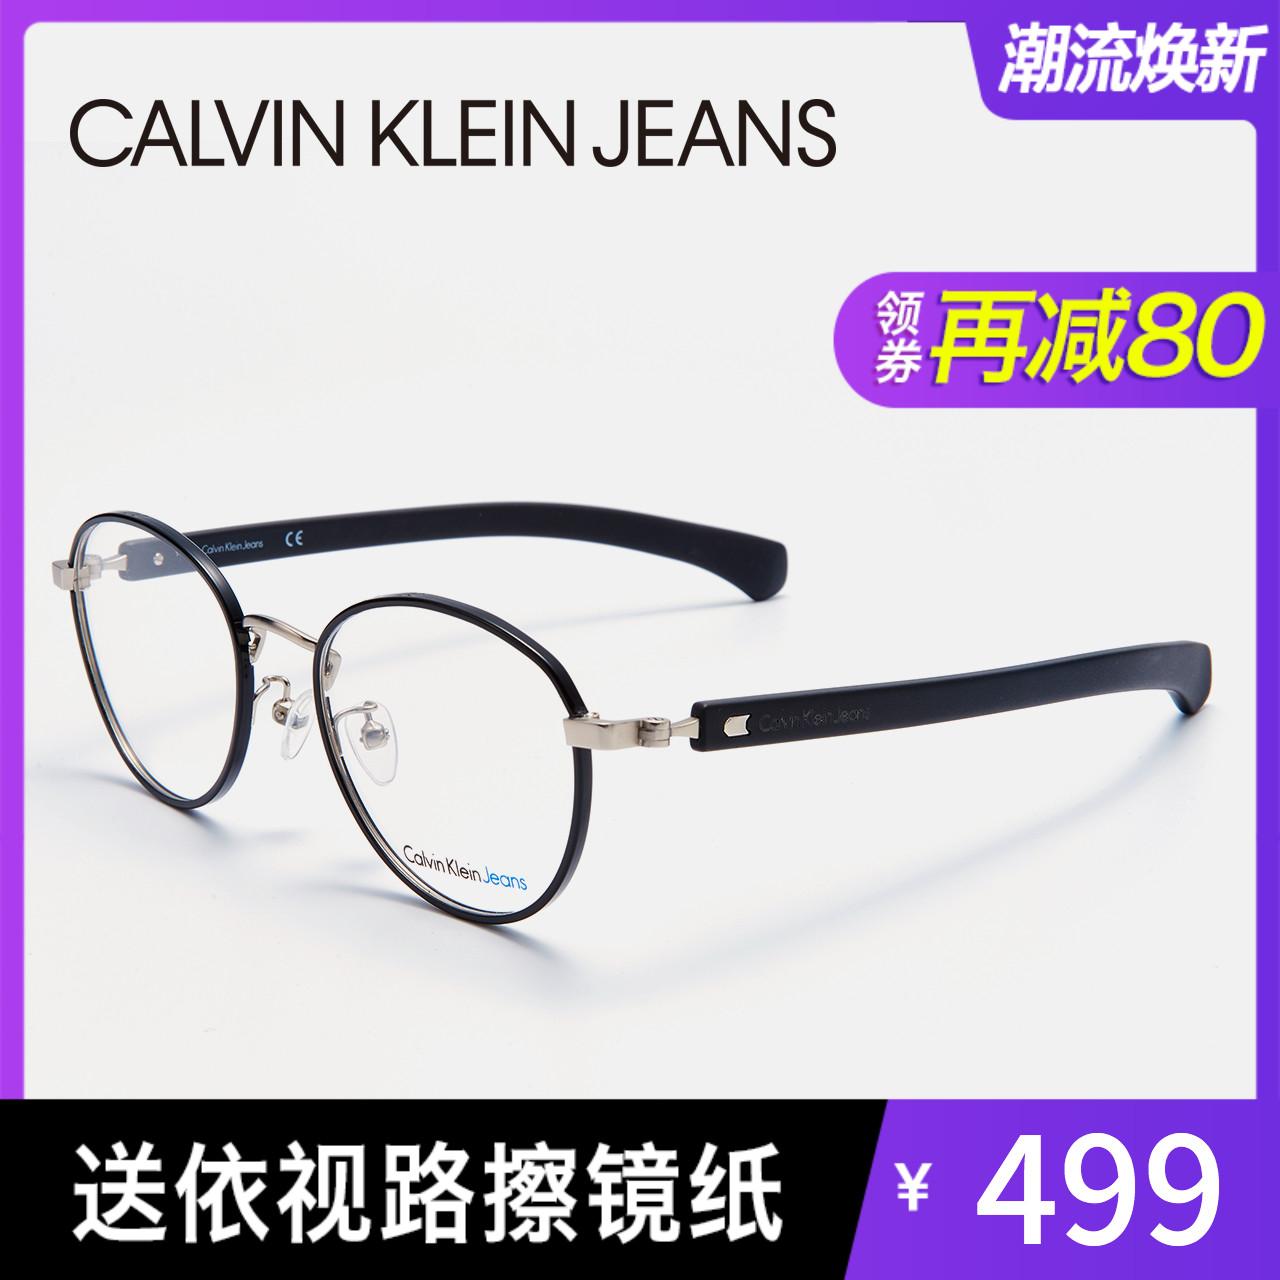 CK JEANS防辐射抗蓝光眼镜女护目镜近视眼可戴电脑眼镜架镜框男潮